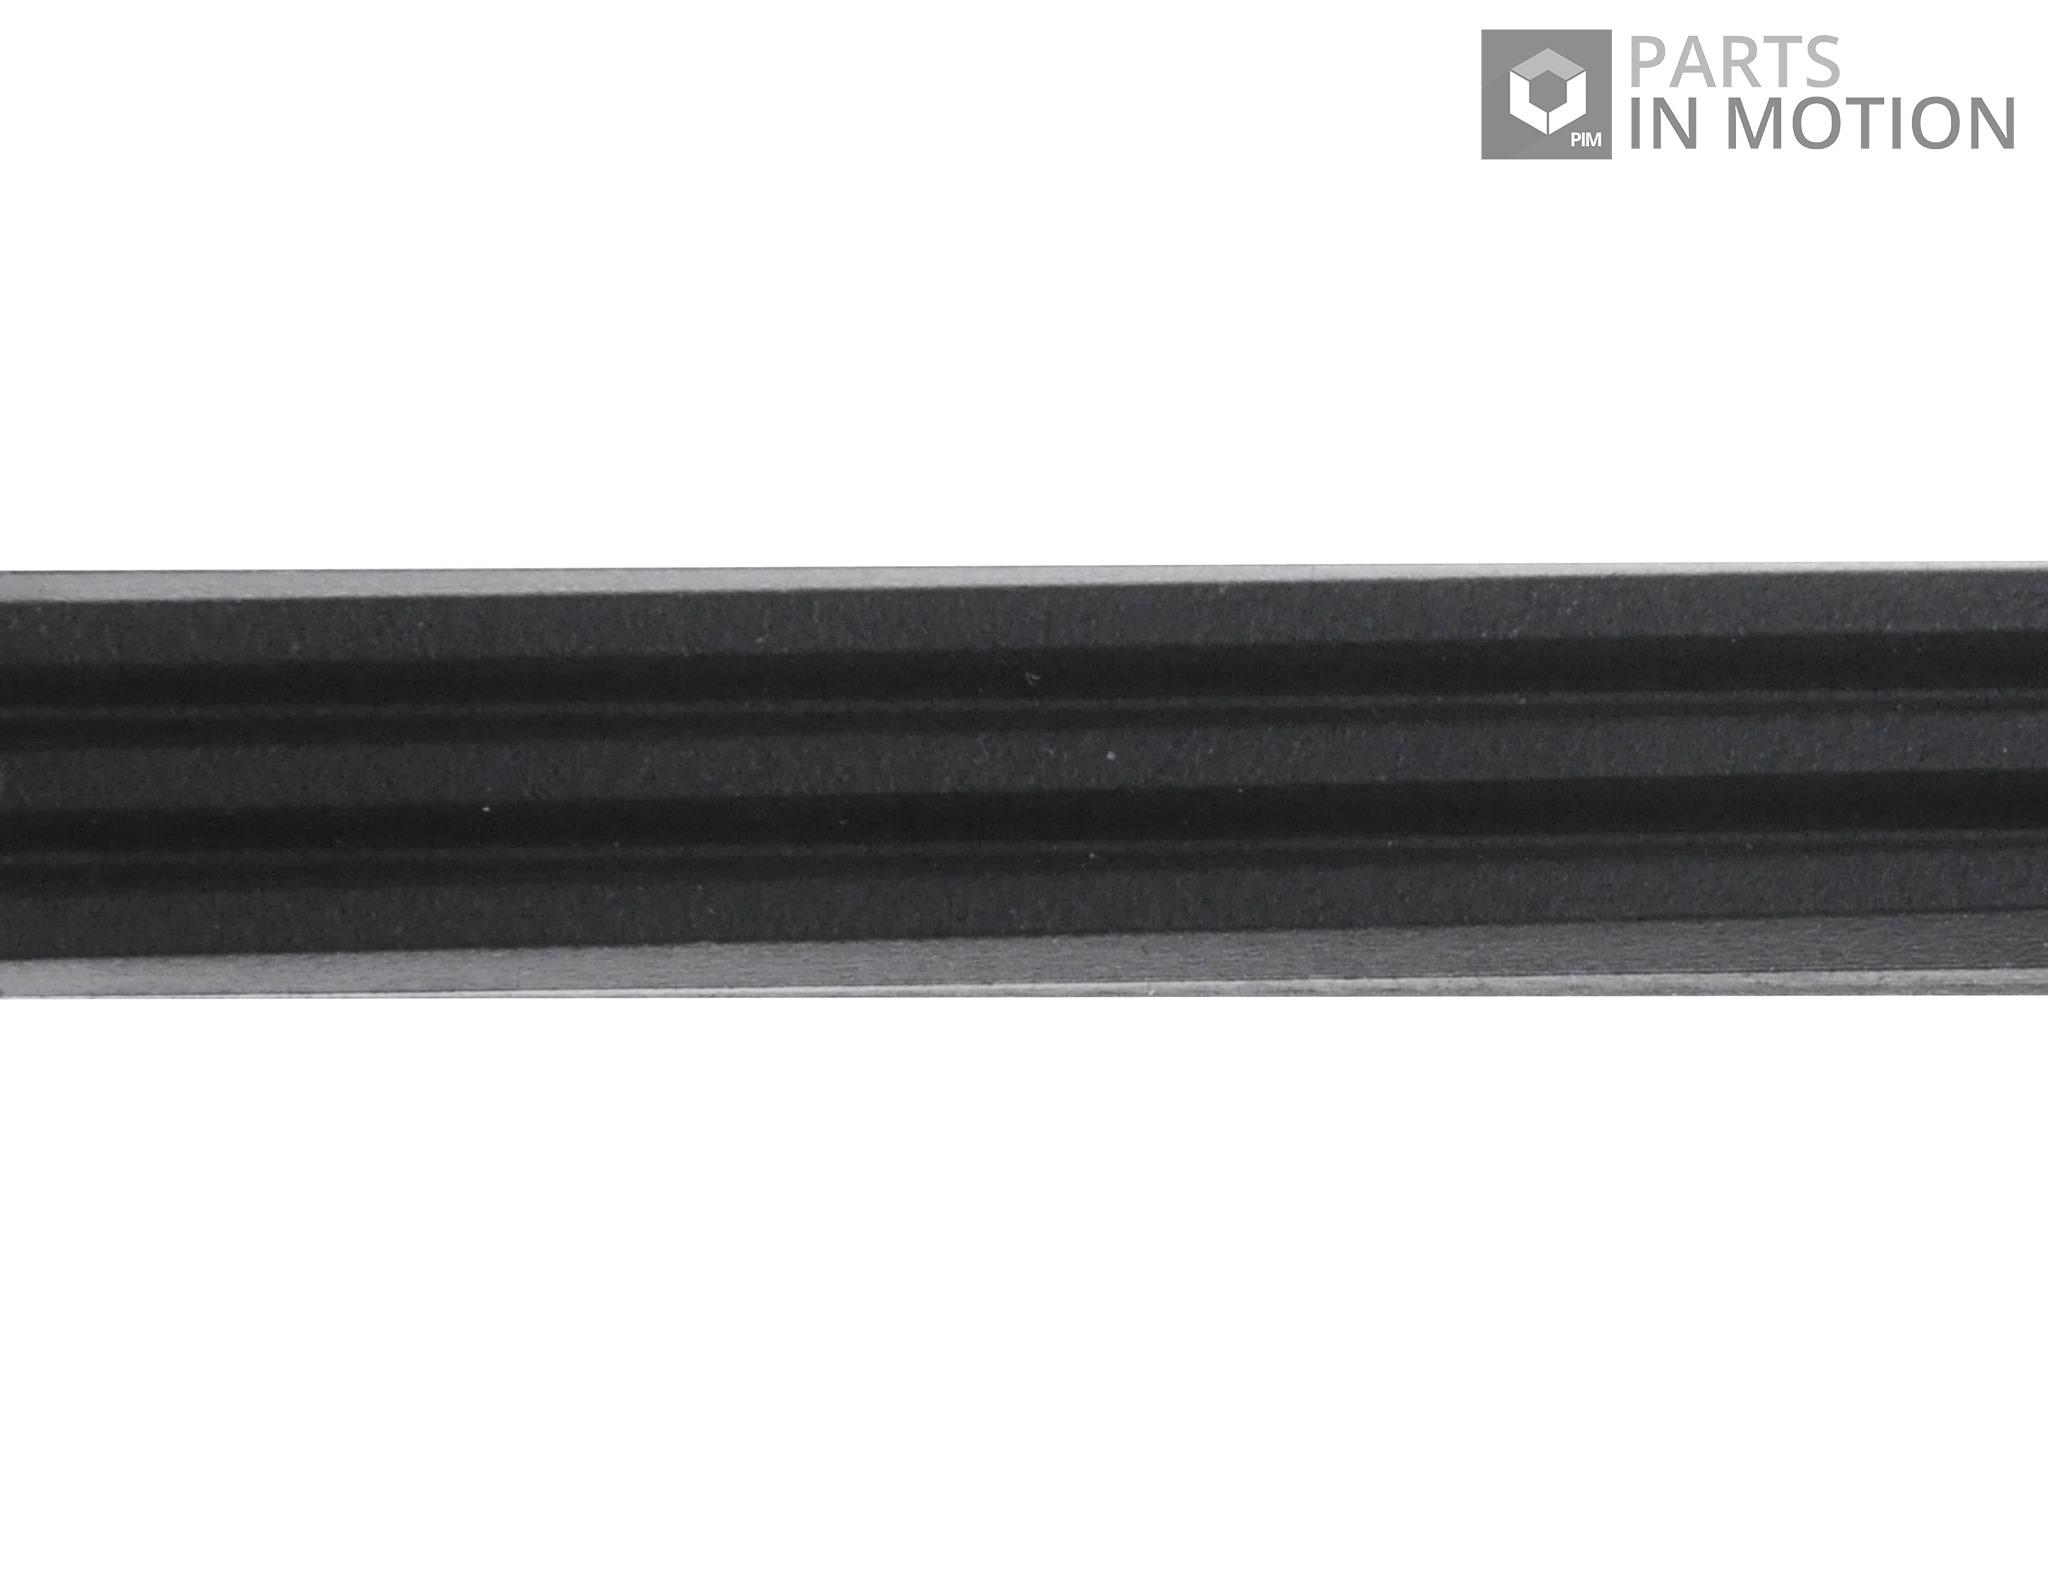 1x Blue Print Auxiliary Belt AD03R641